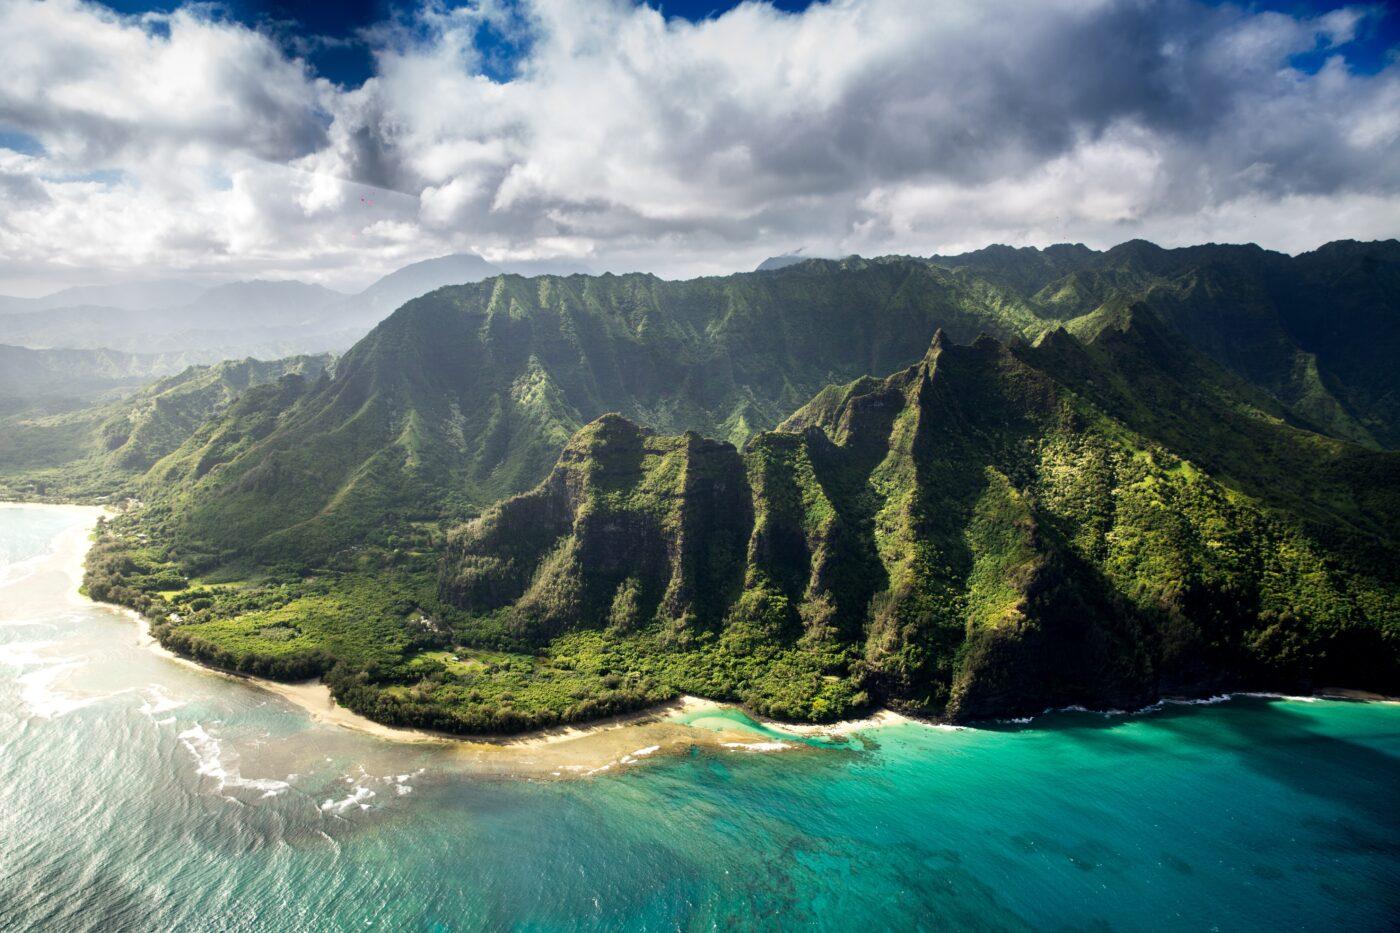 All about Kauai, Garden Isle in Hawaii